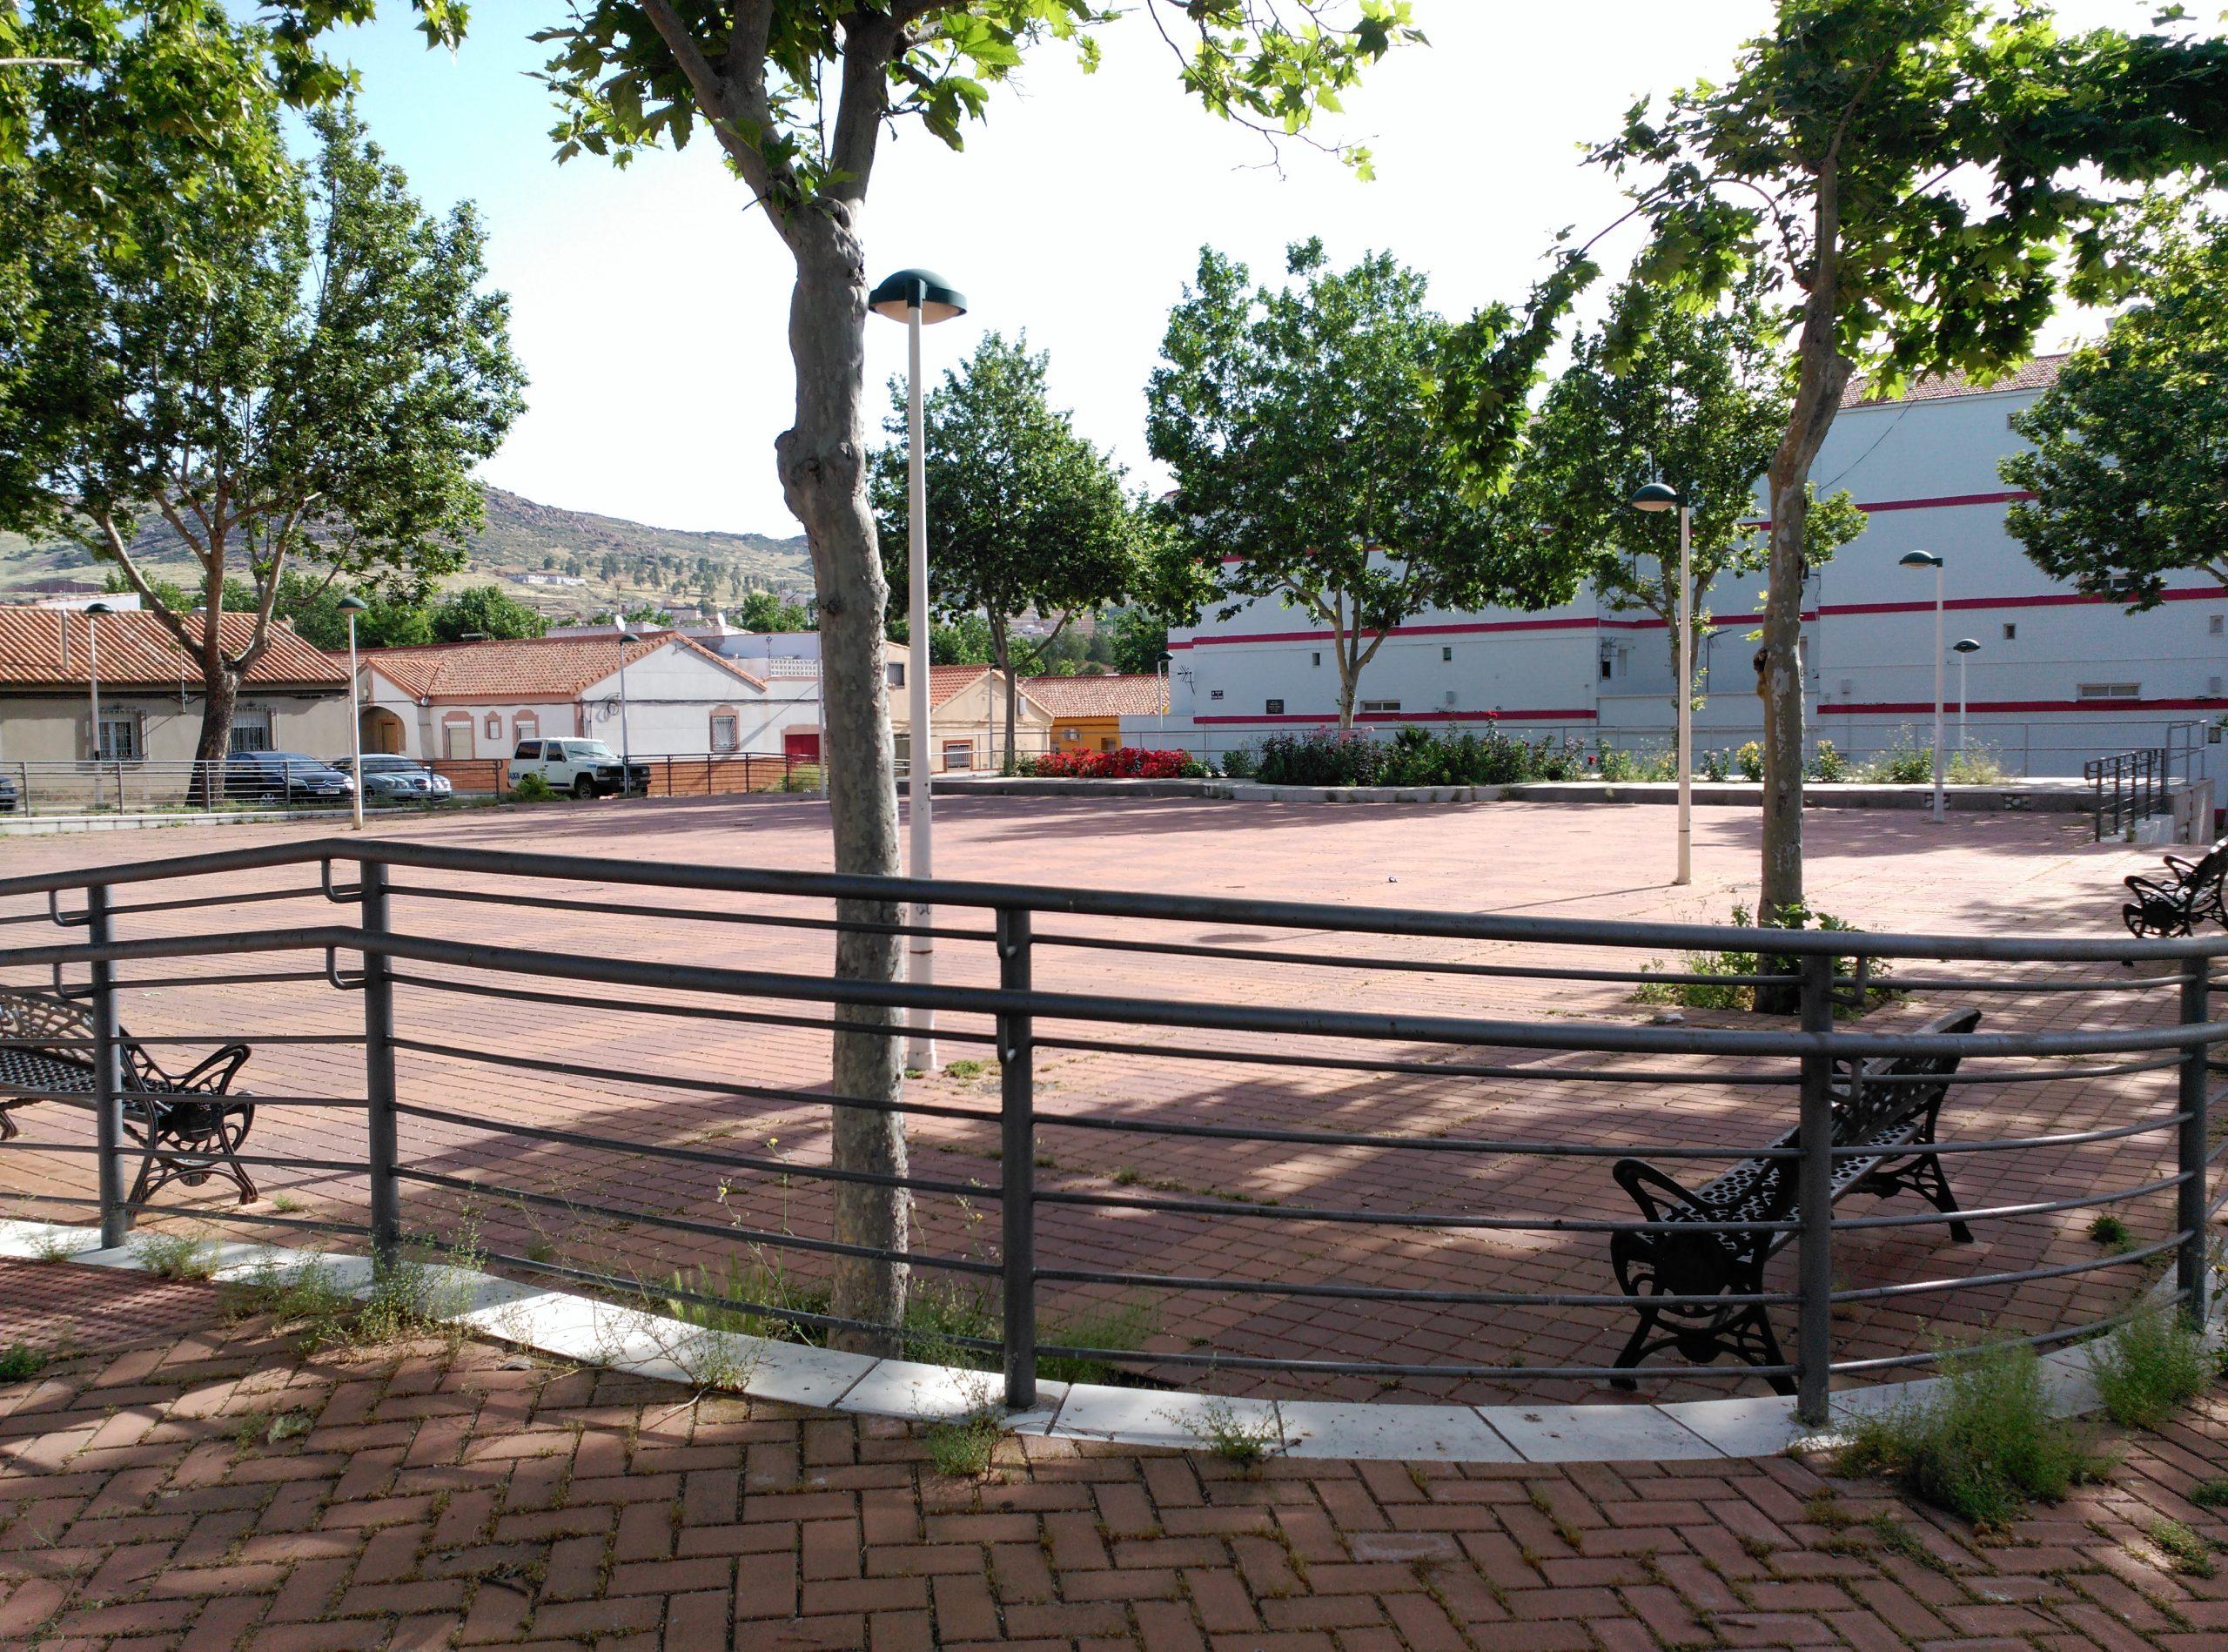 Plaza Gascón Bueno. Barriada de la Libertad Fotografía F. Negrete 2017